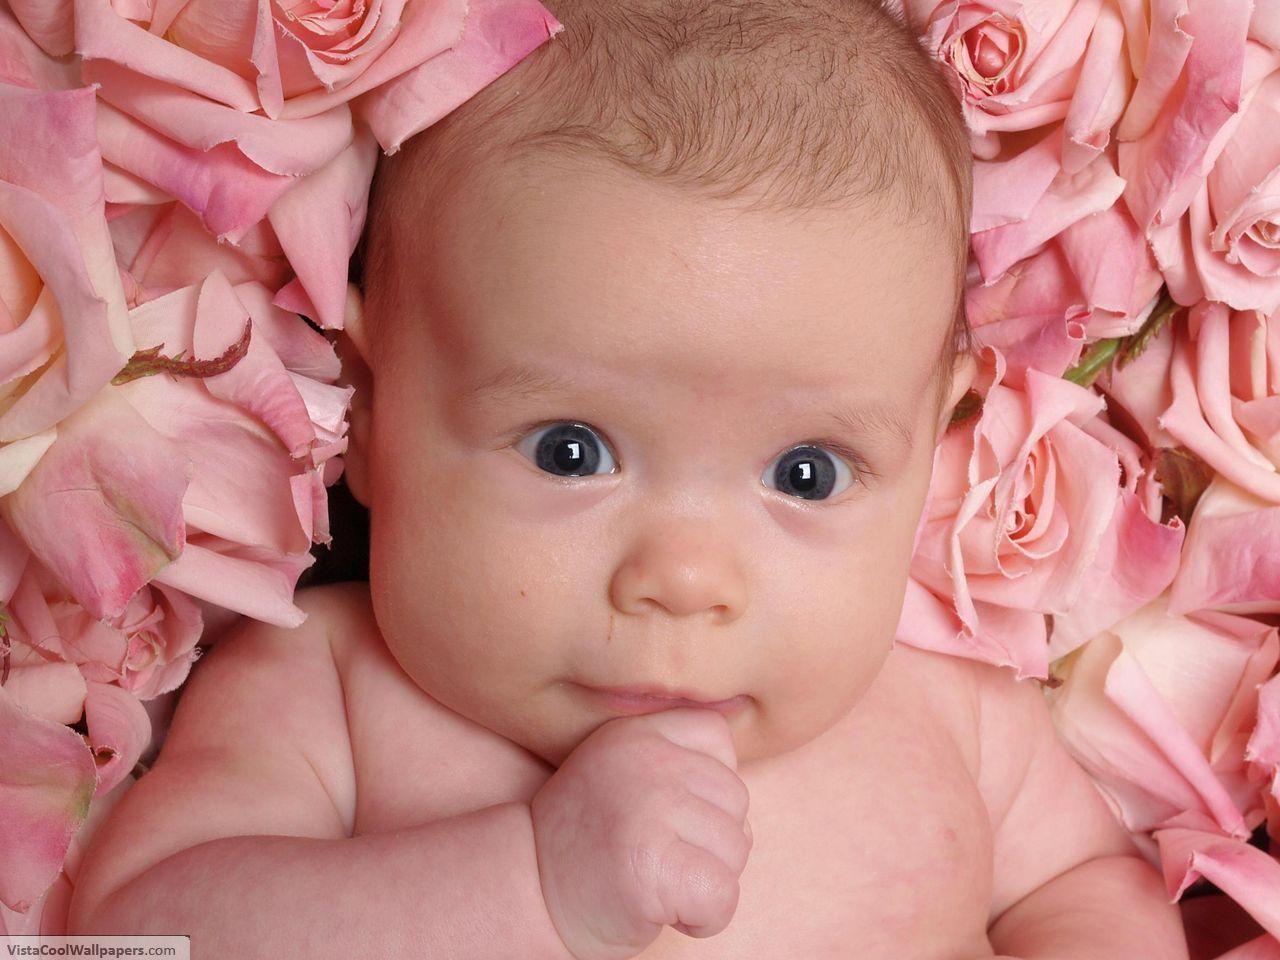 http://1.bp.blogspot.com/_mhVSKanXNRo/TUzevHL4QRI/AAAAAAAAARA/xdfAGcf3TjQ/s1600/Pink+Flowers+Pink+Baby.jpeg